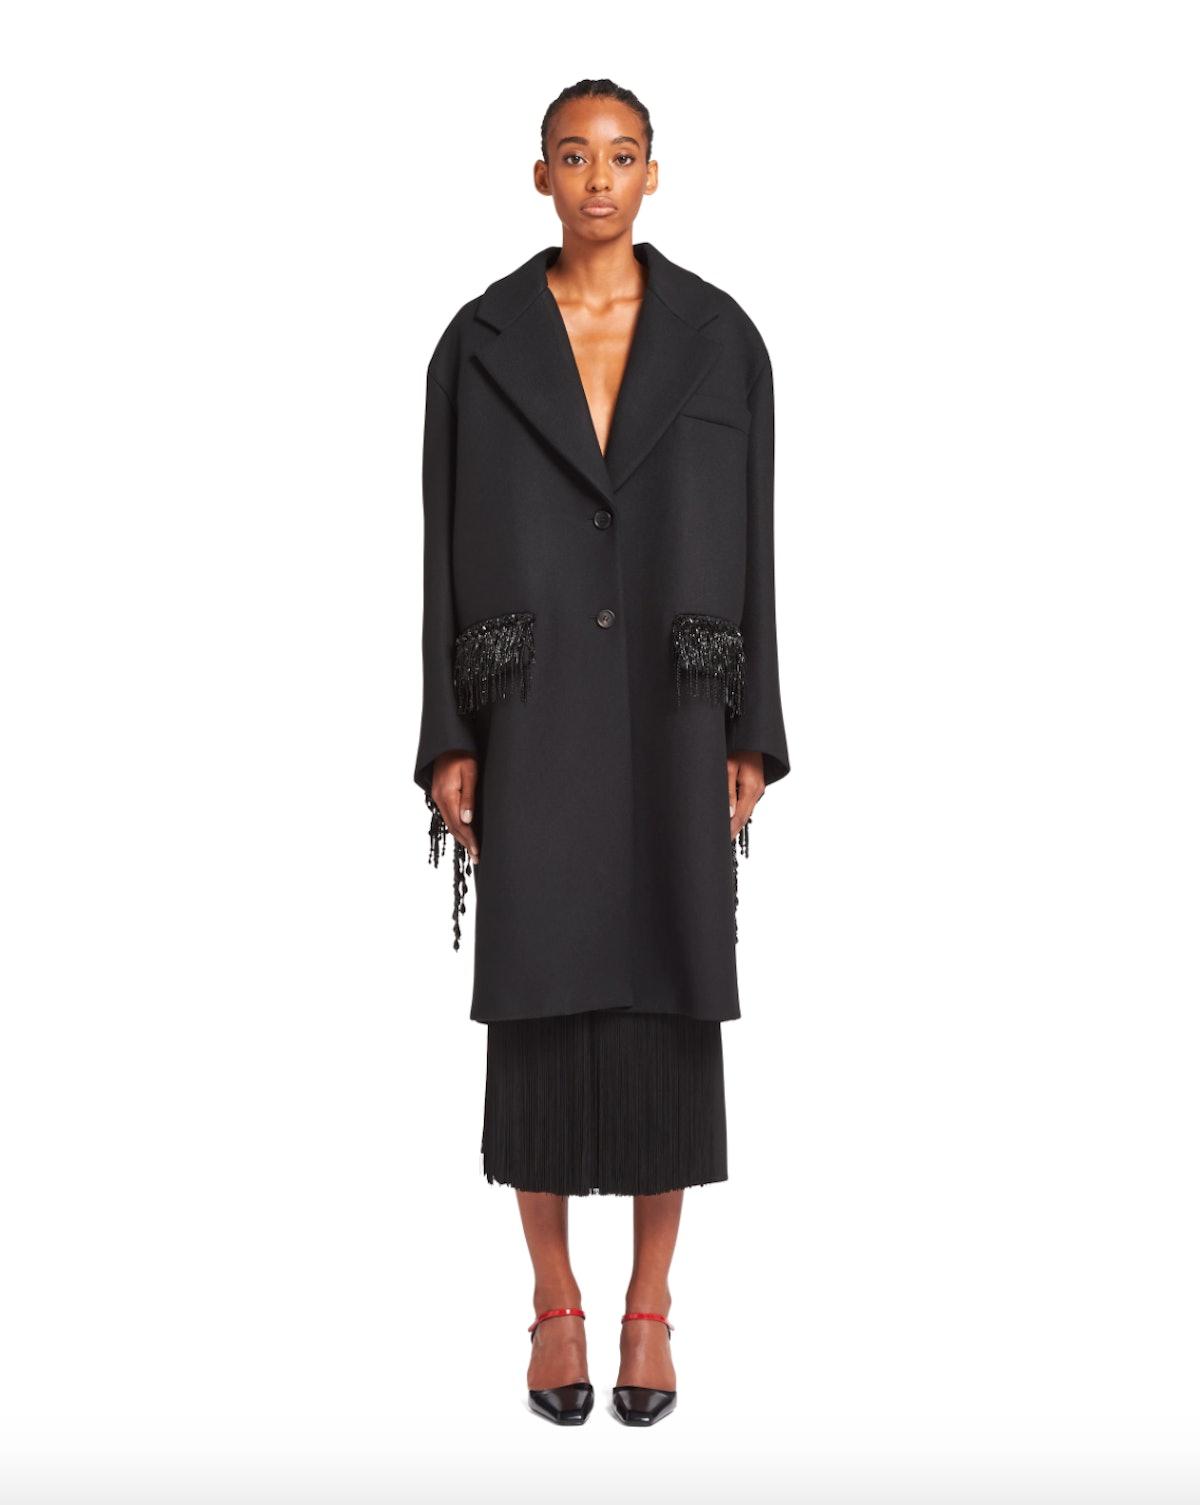 Prada Embellished Single-Breasted Textured Wool Coat